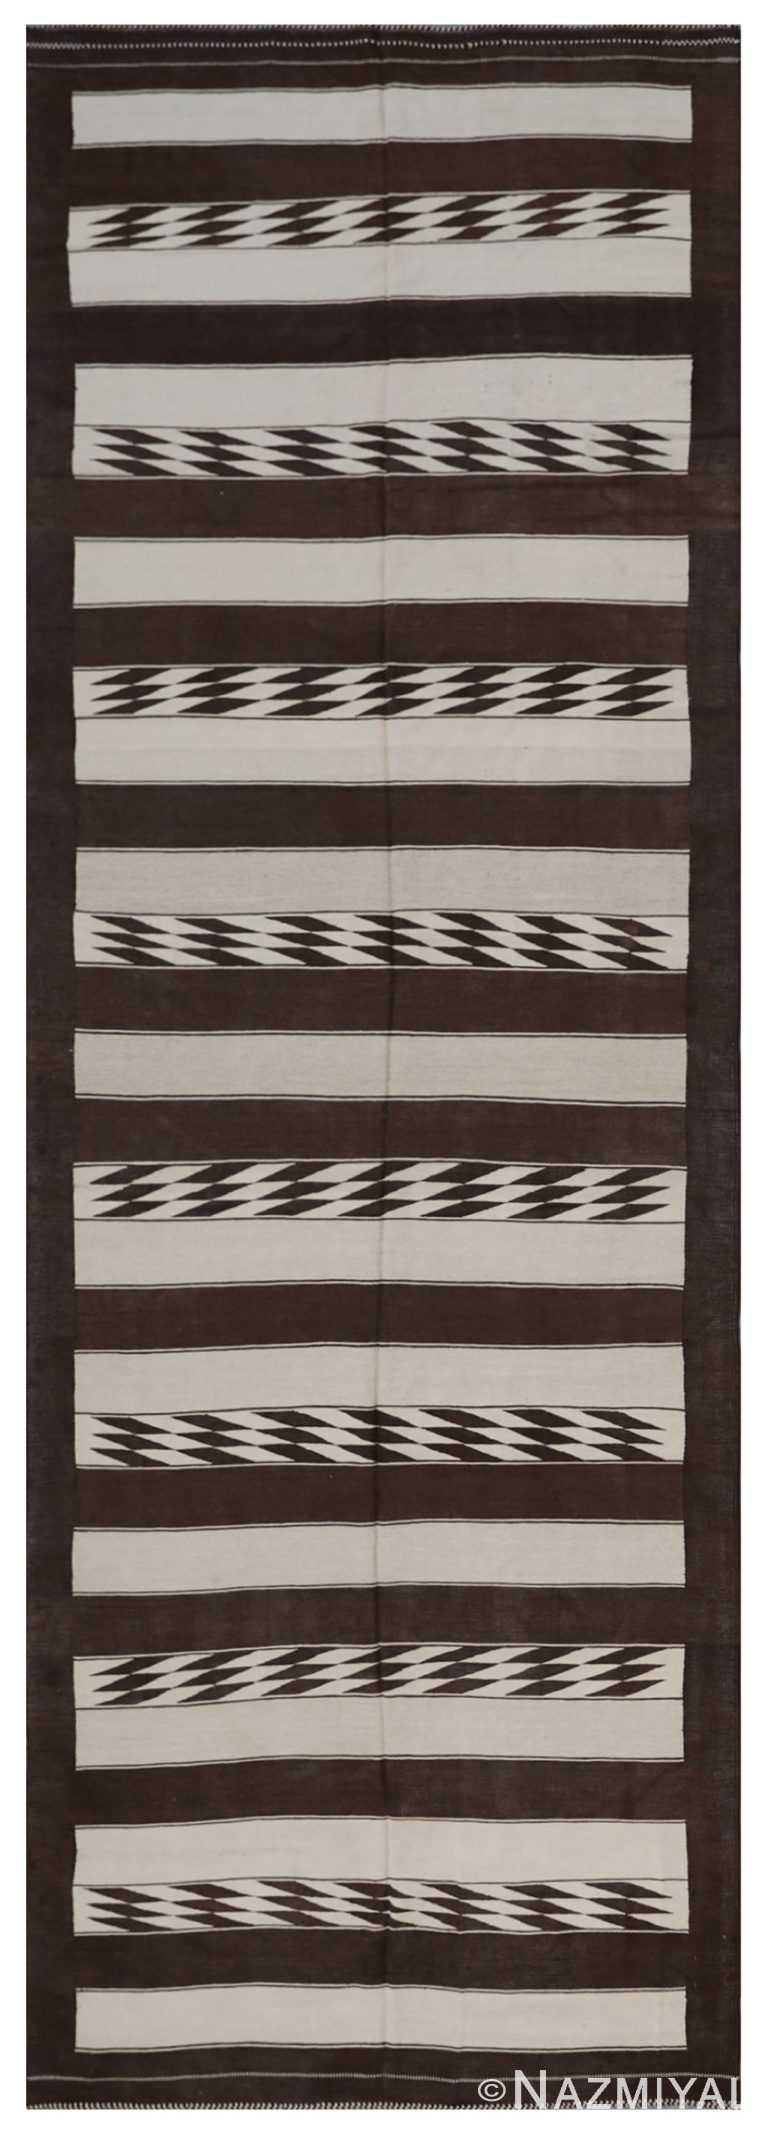 Modern Flat Weave Rug 801916046 by Nazmiyal NYC